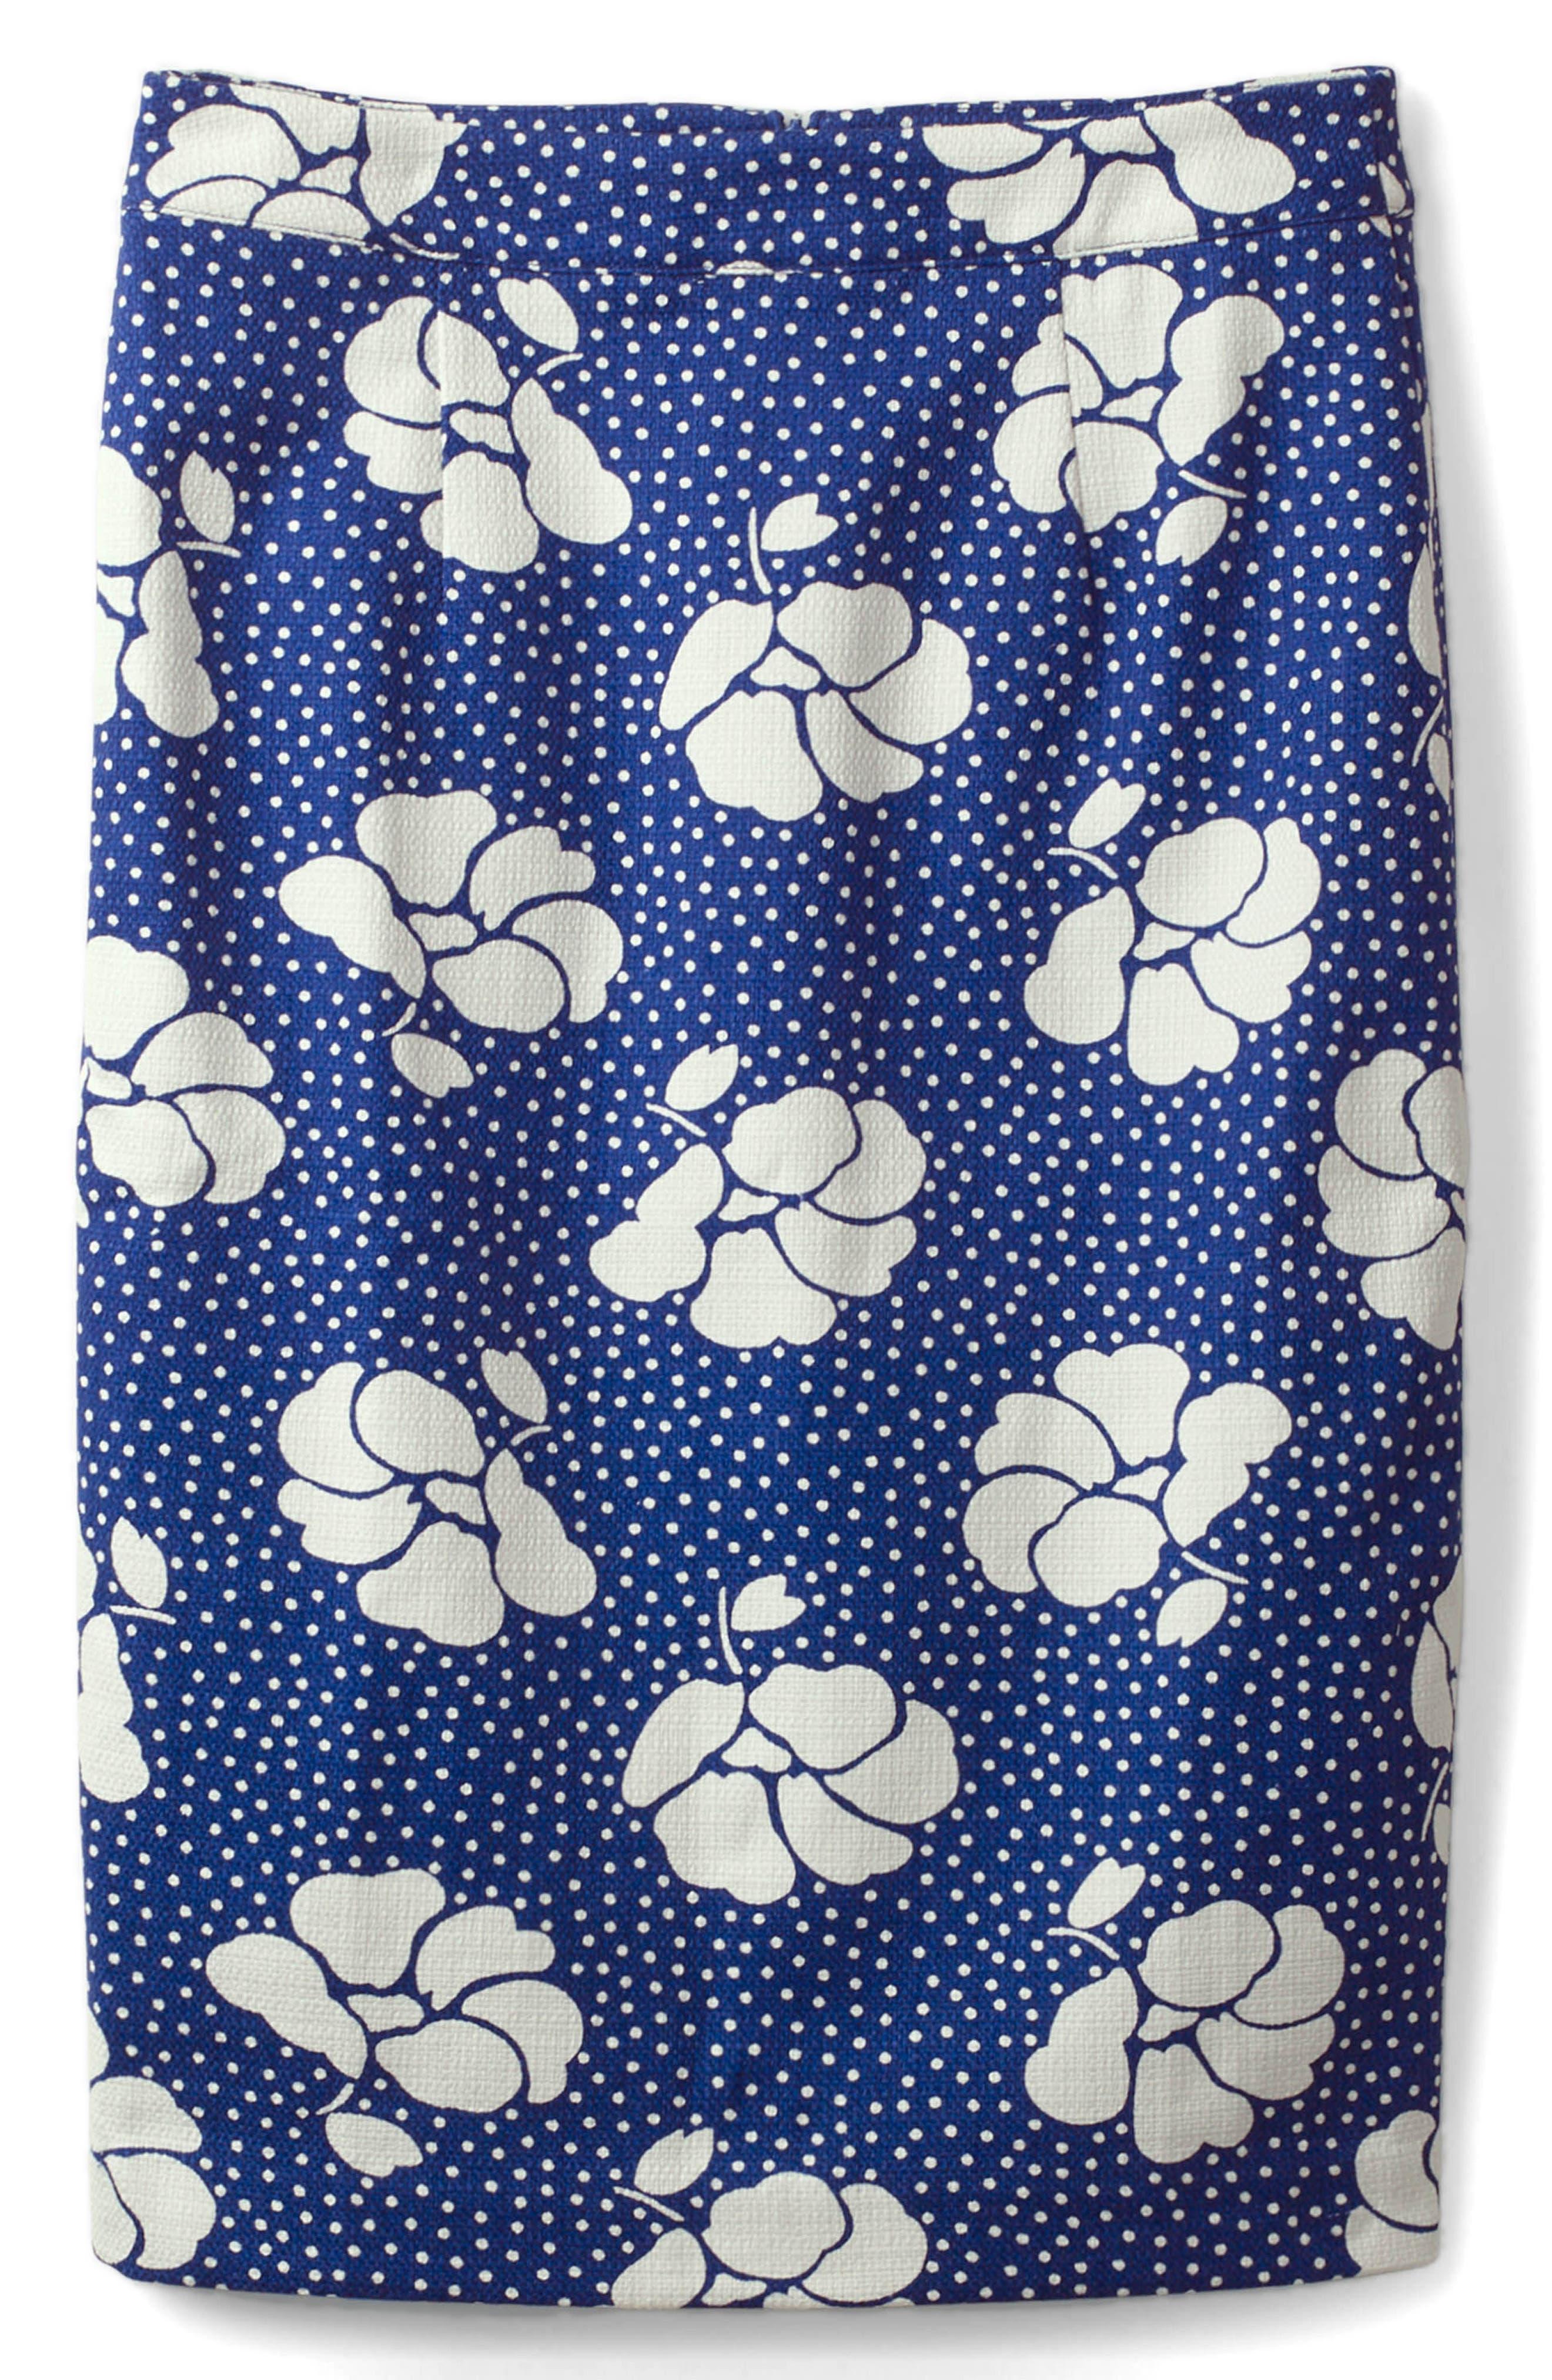 BODEN Martha Floral Pencil Skirt, Main, color, 304